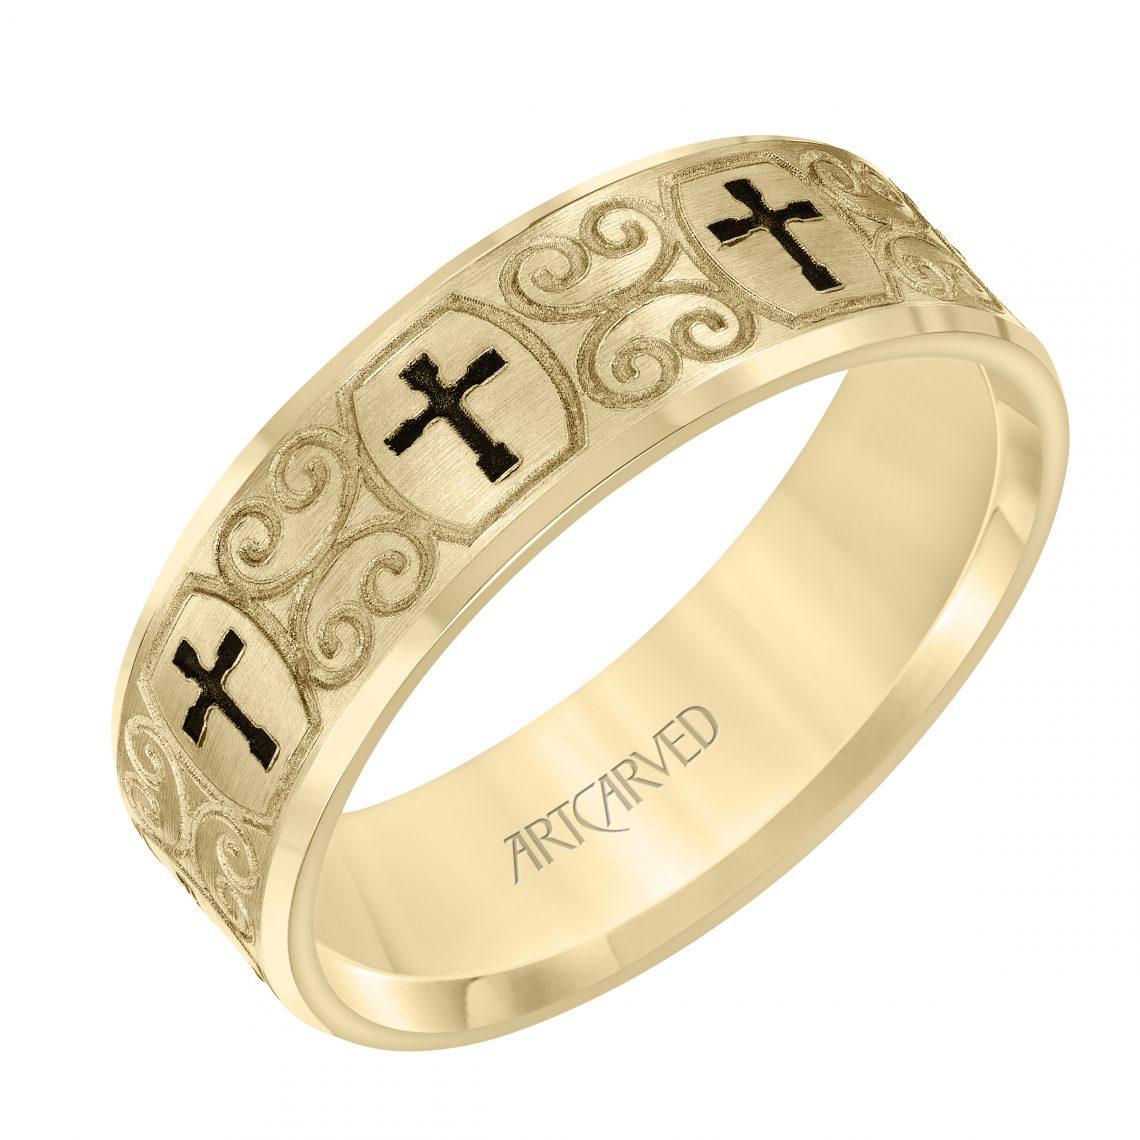 Custom Wedding Bands Northfield Elegant Jewelry For Her Sage